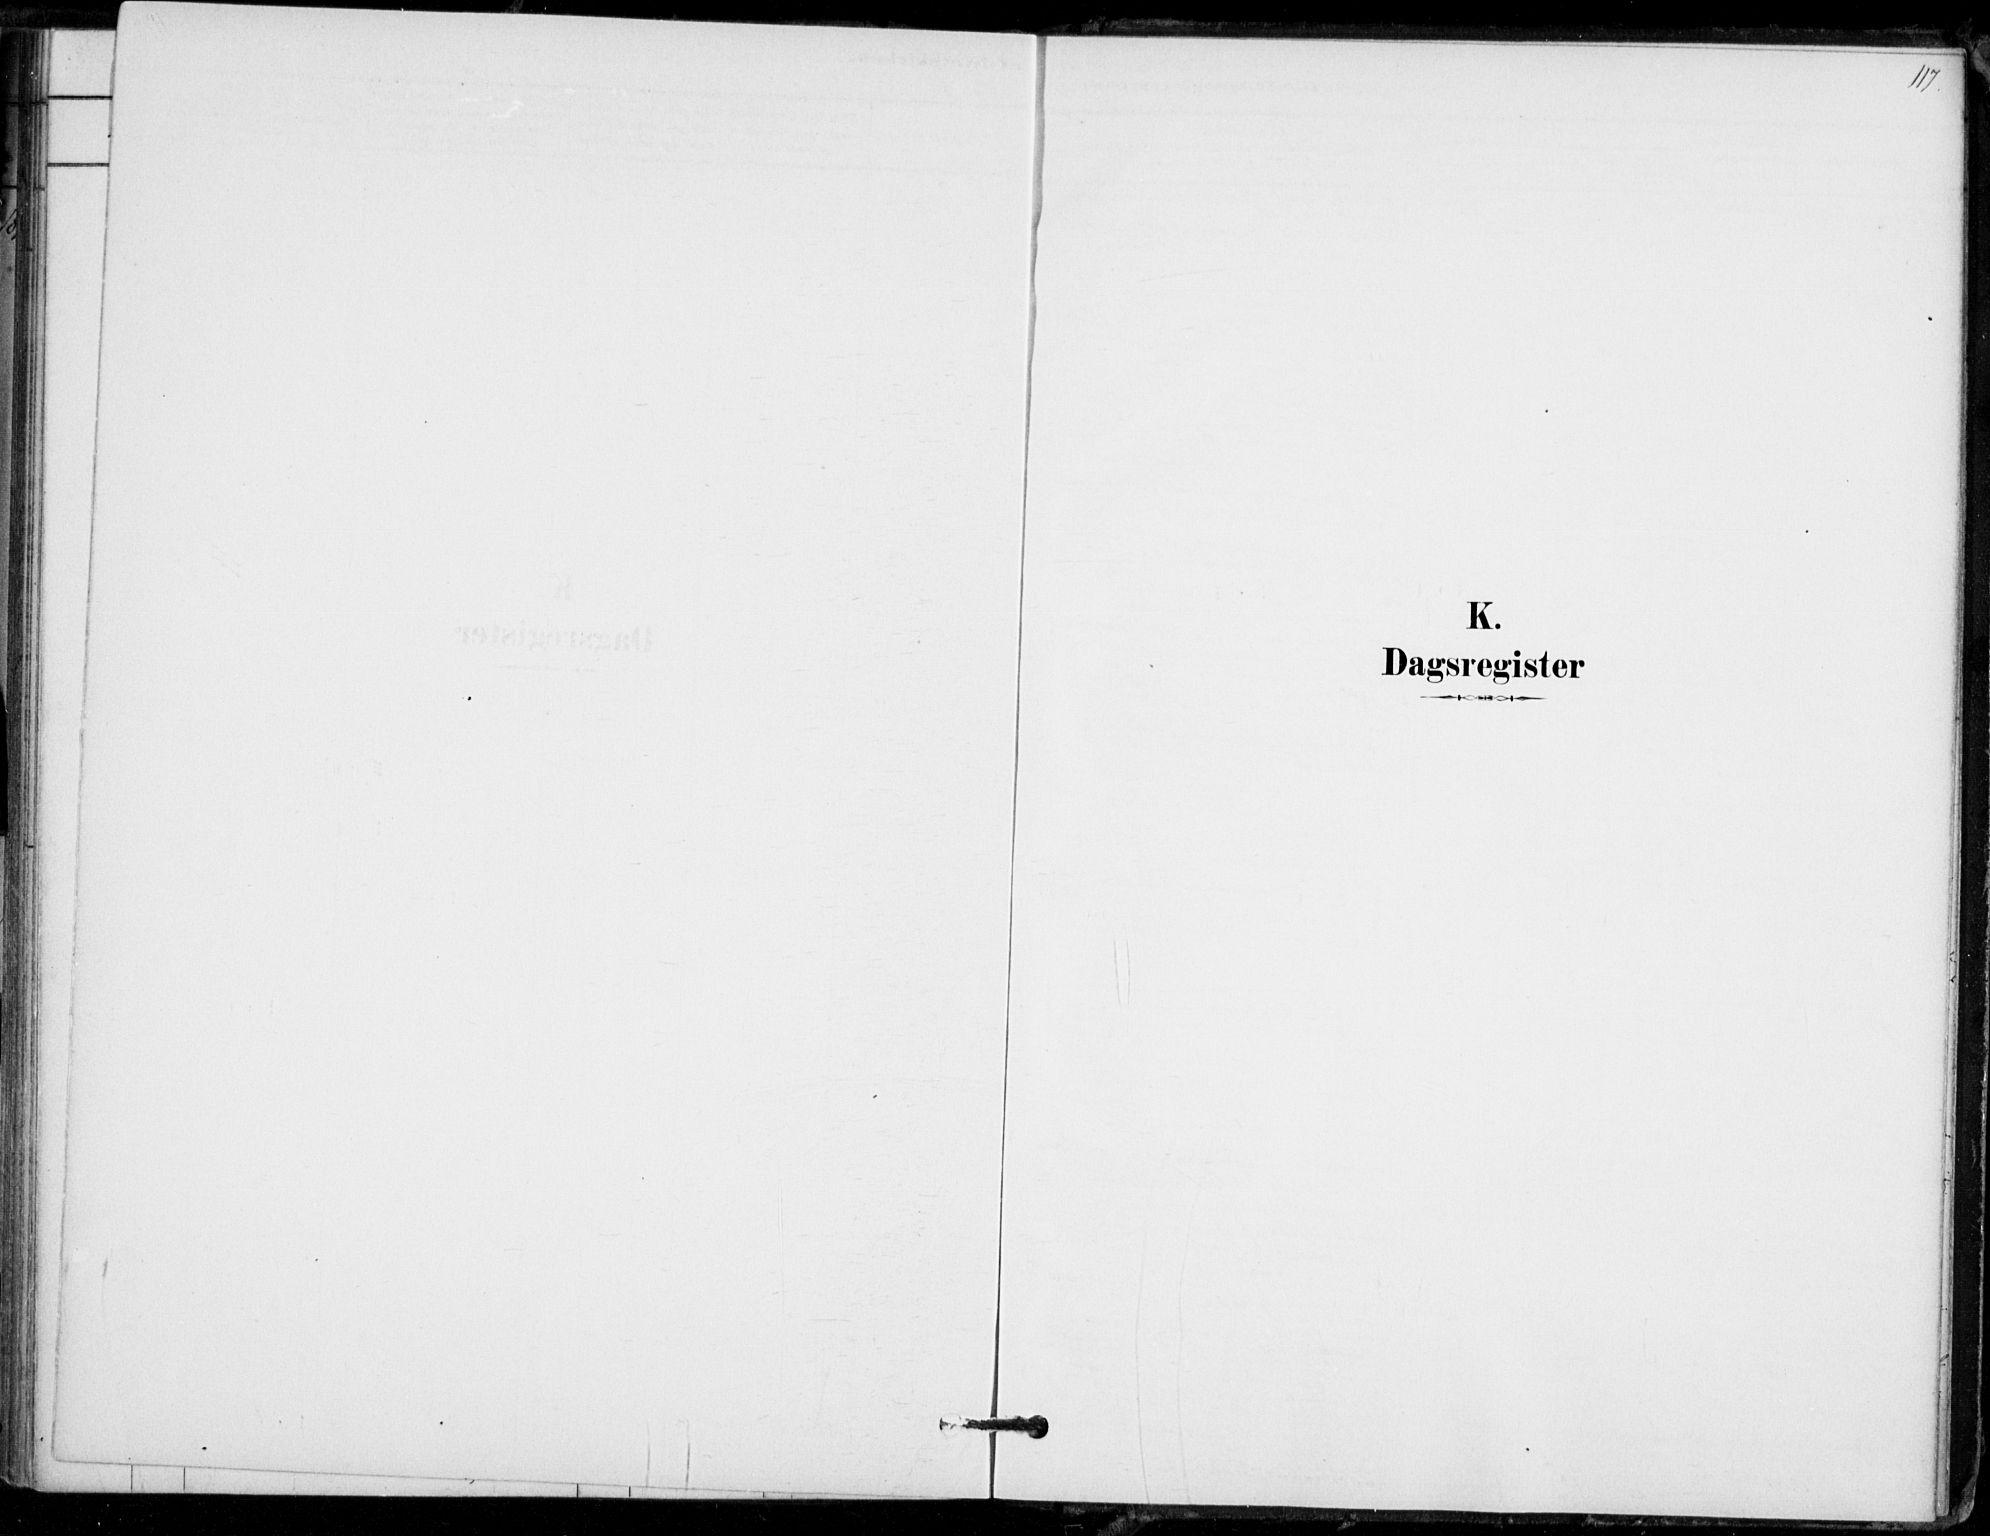 SAKO, Hof kirkebøker, F/Fb/L0001: Ministerialbok nr. II 1, 1878-1907, s. 117